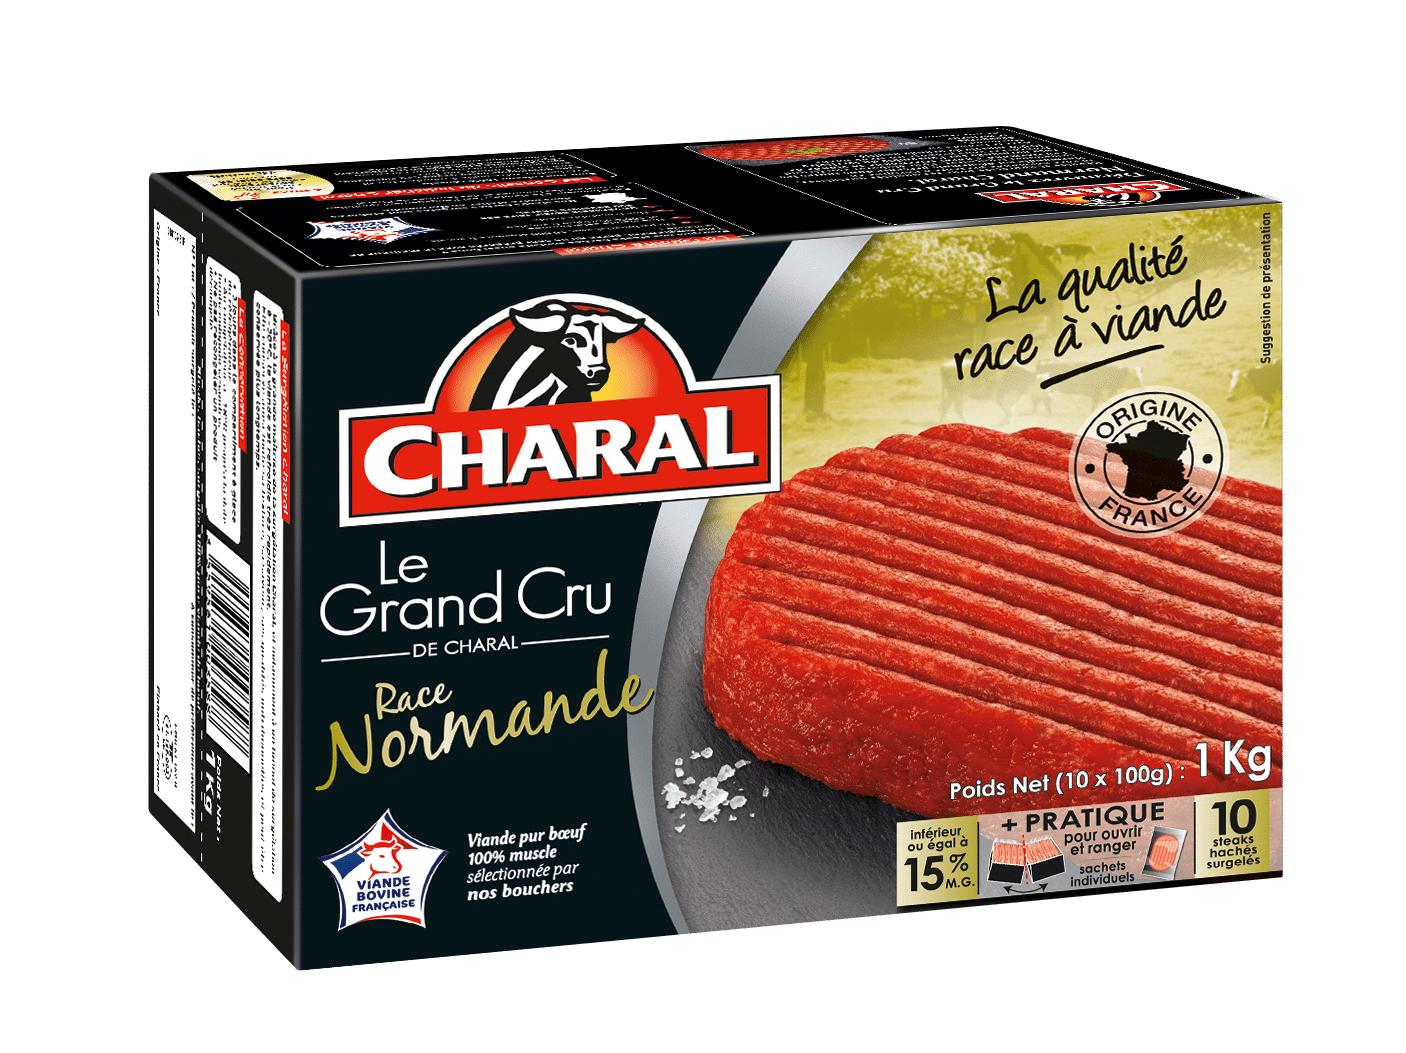 Steak haché Normand Grand Cru pur bœuf surgelé 15% MG à griller - charal.fr